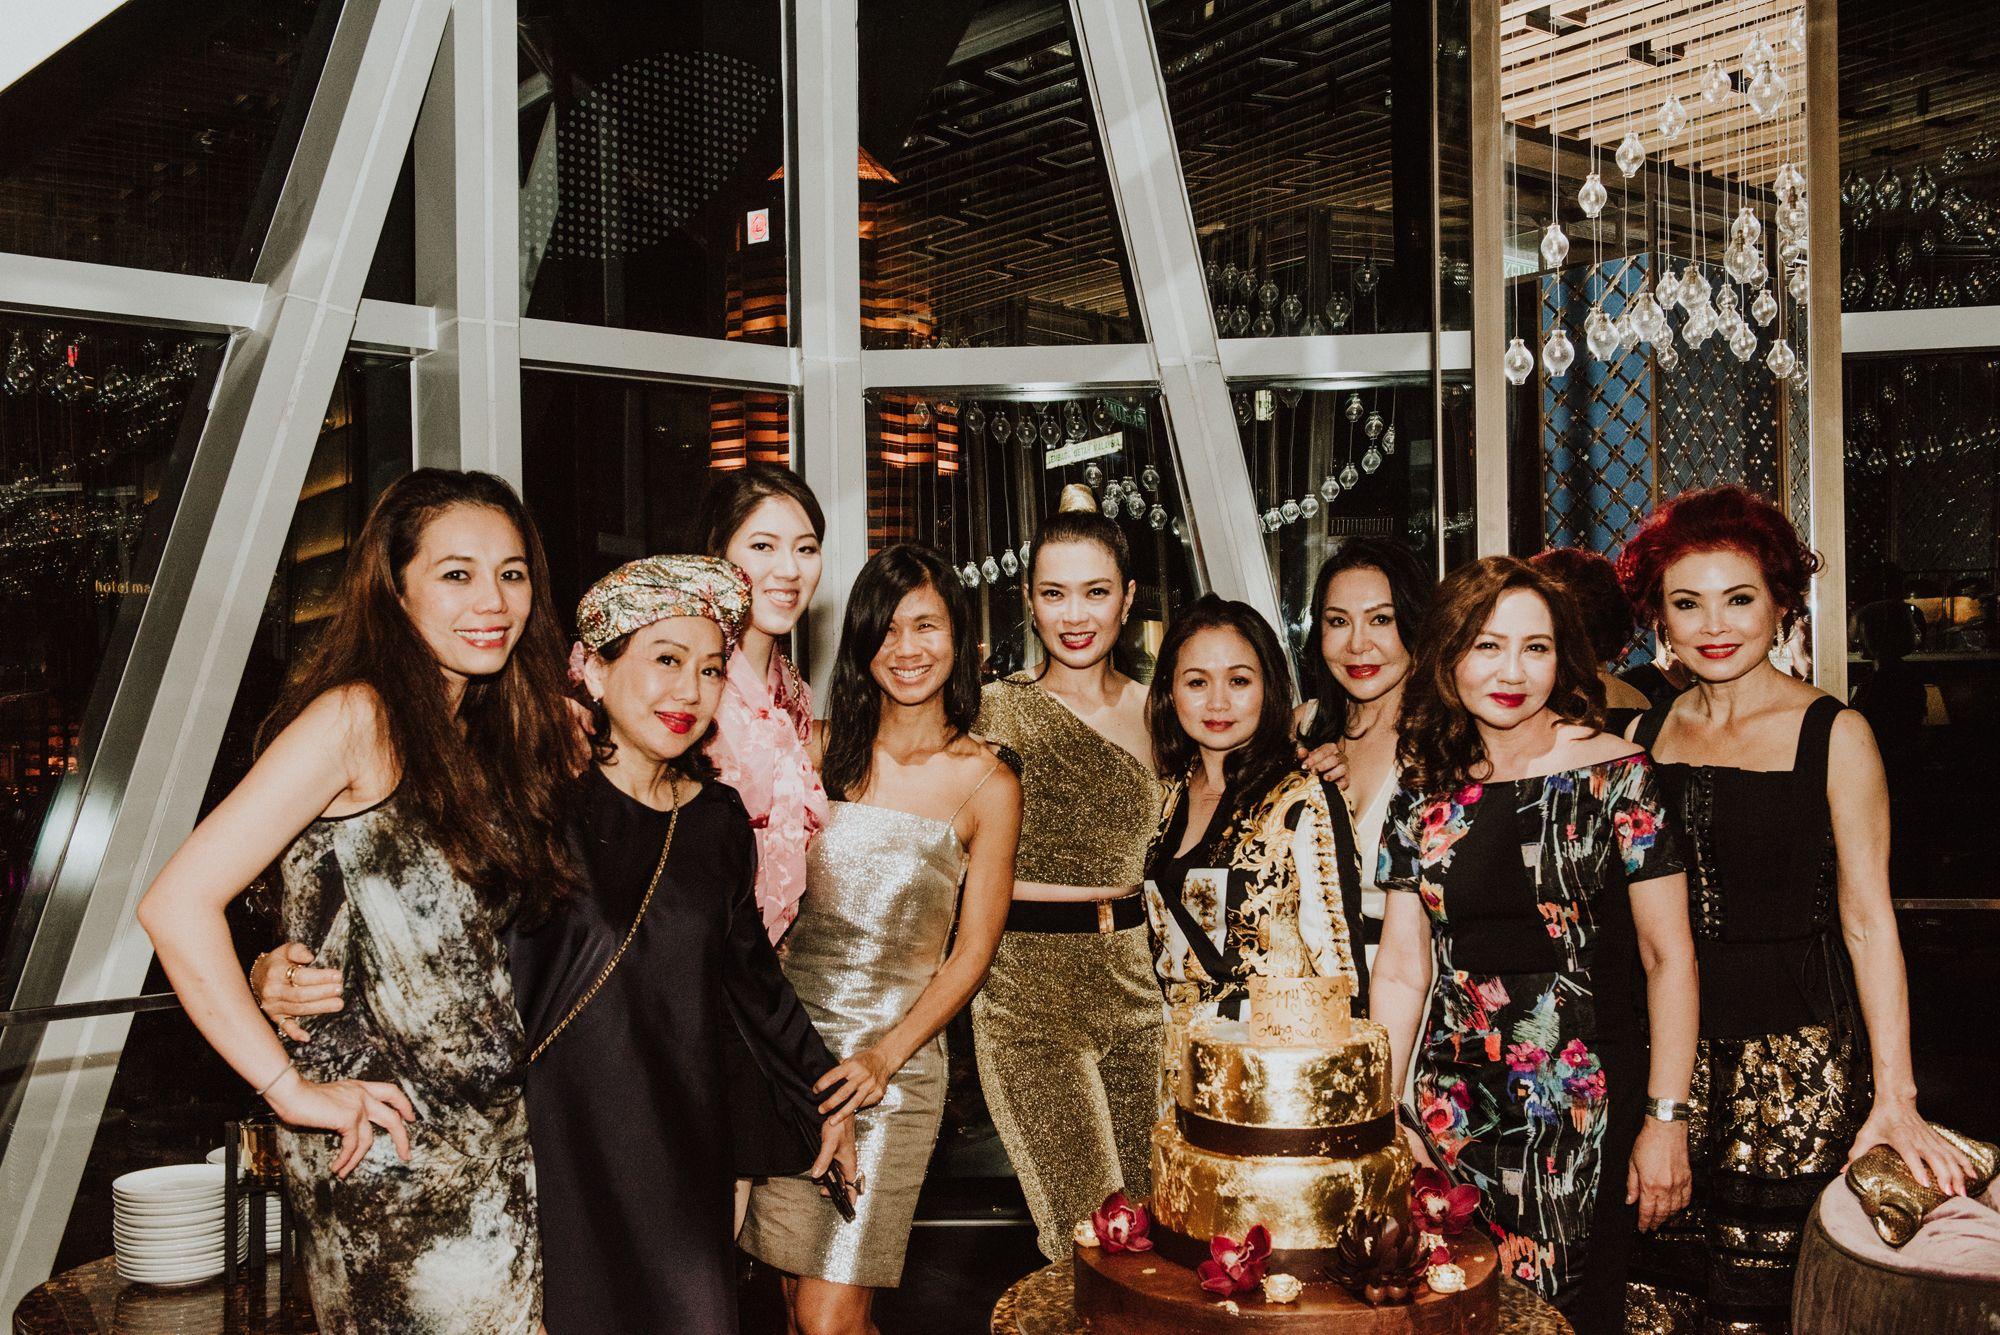 Ginny Wiluan, Jane Soon, Zeena Tan, Clara Goh, Ho Ching Lin, Tonya LayTin Tan, Diana Widjaja, Maria See, Linda Soo-Tan